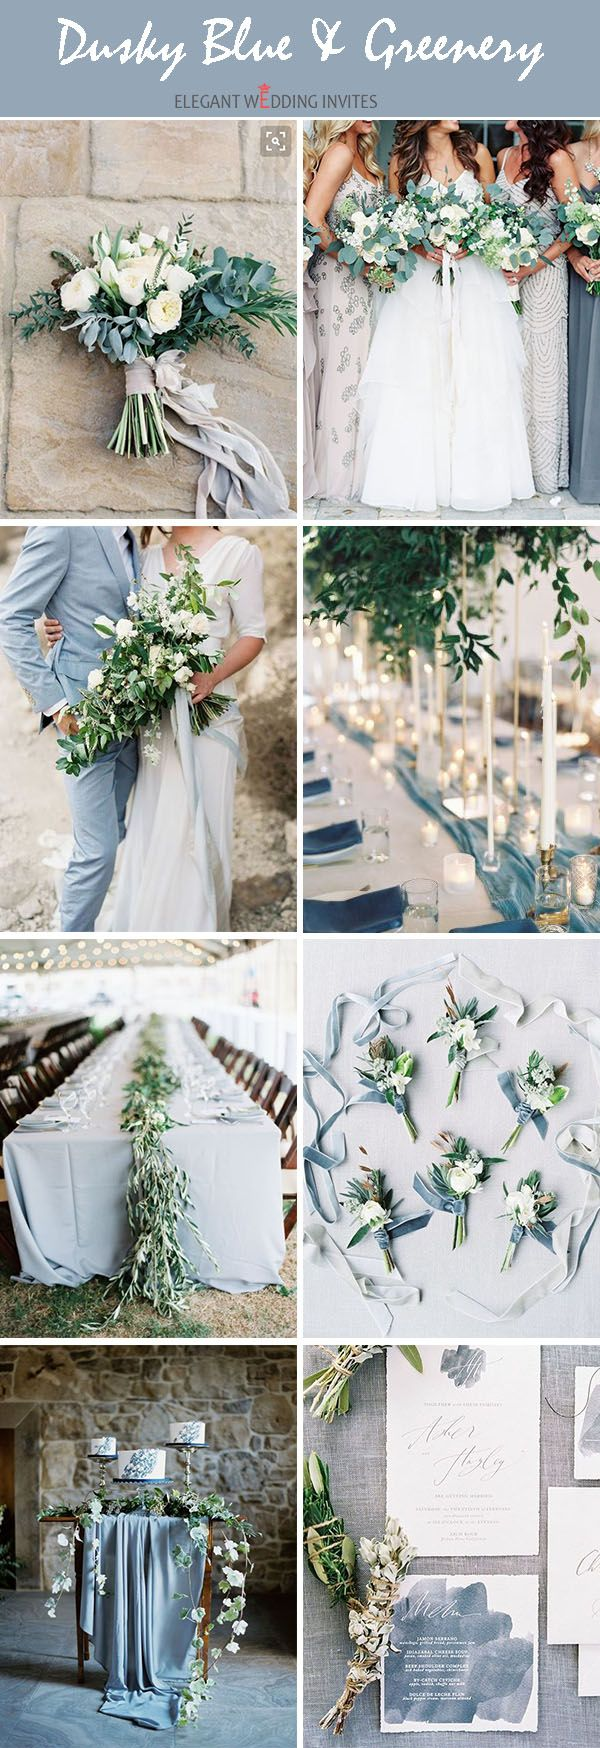 Trending-Dark Romance Moody Hues for Fall & Winter Wedding Color ...